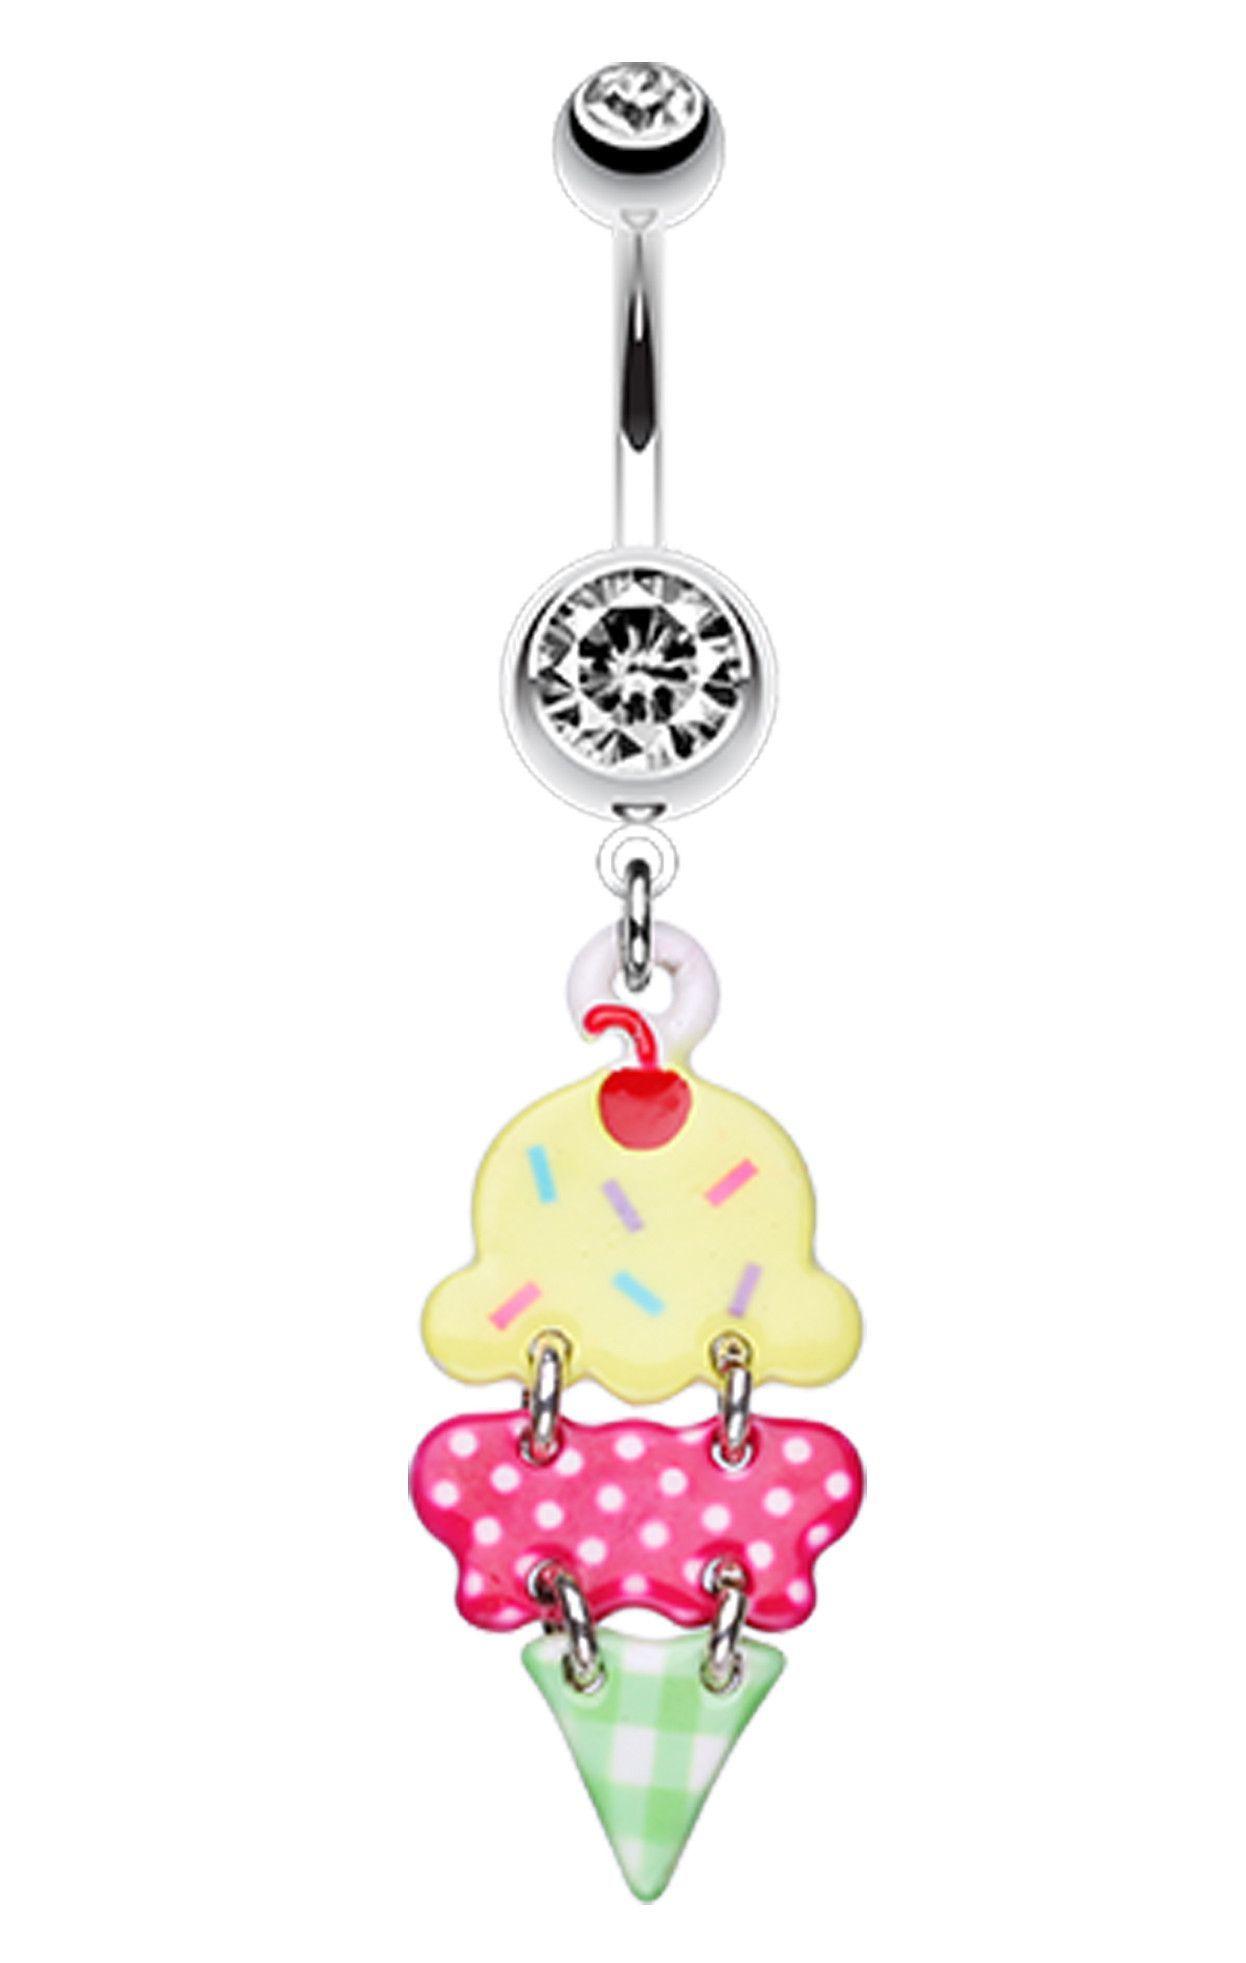 Belly button piercing jewellery  Double Scoop Ice Cream Cone Belly Button Ring  Ice cream cones